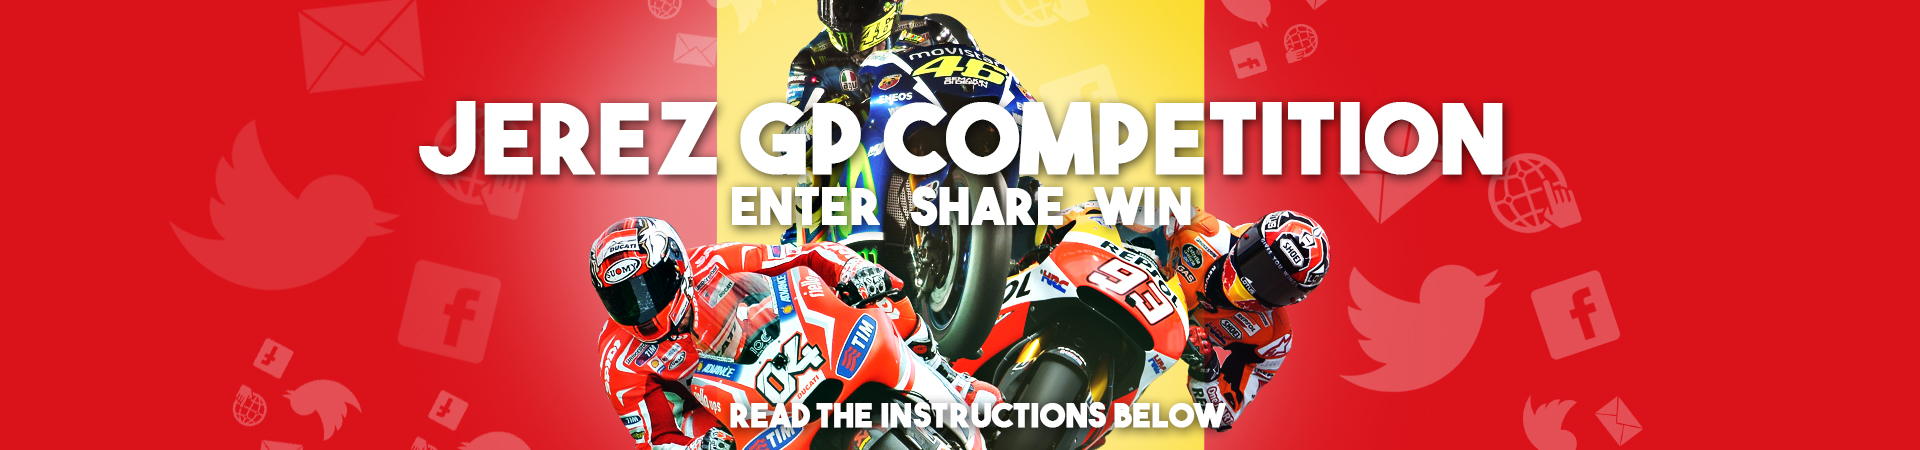 motoGP header jerez competition